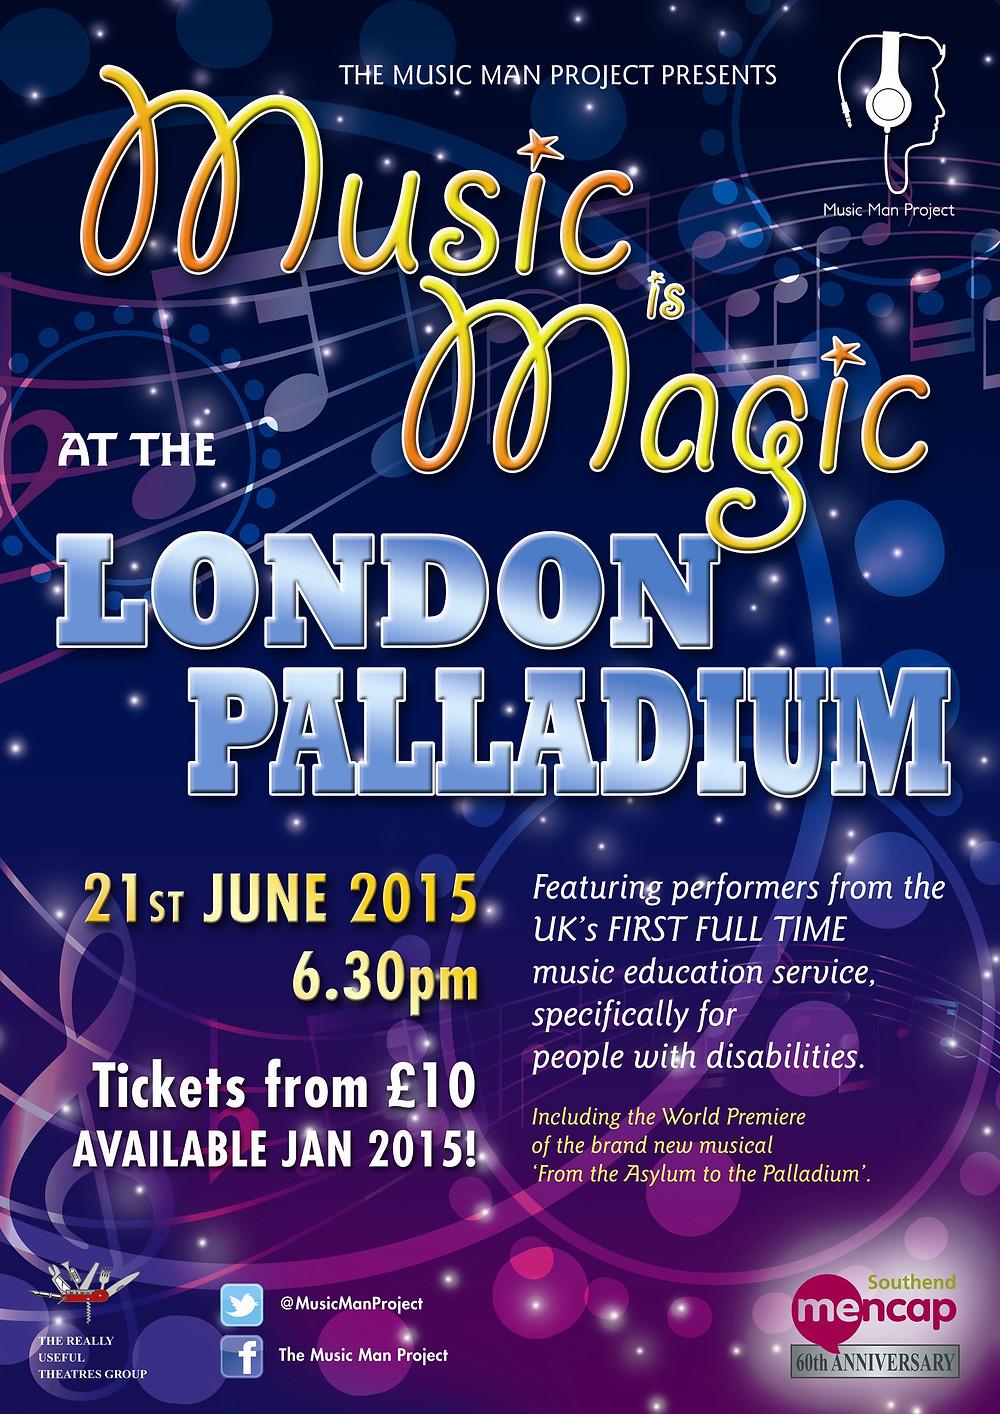 London_Palladium_Concert_Poster.jpg